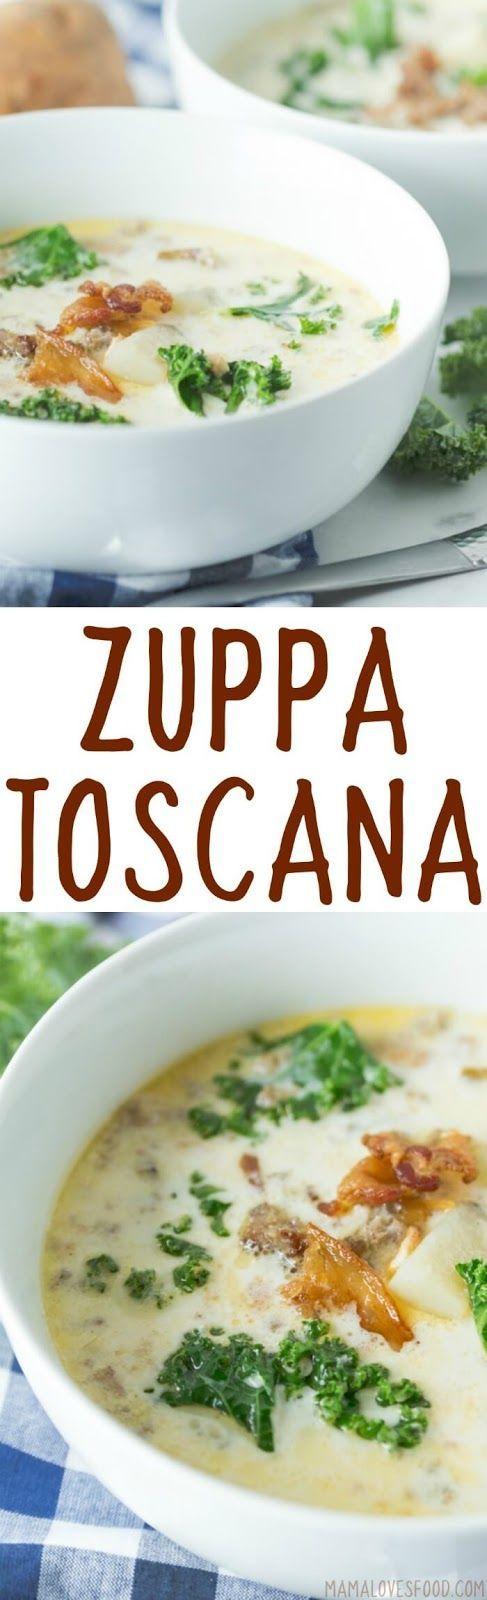 made it tonight! even better than Olive Garden!!! Zuppa Toscana {Creamy Potato Sausage Soup} - Olive Garden Copycat Recipe